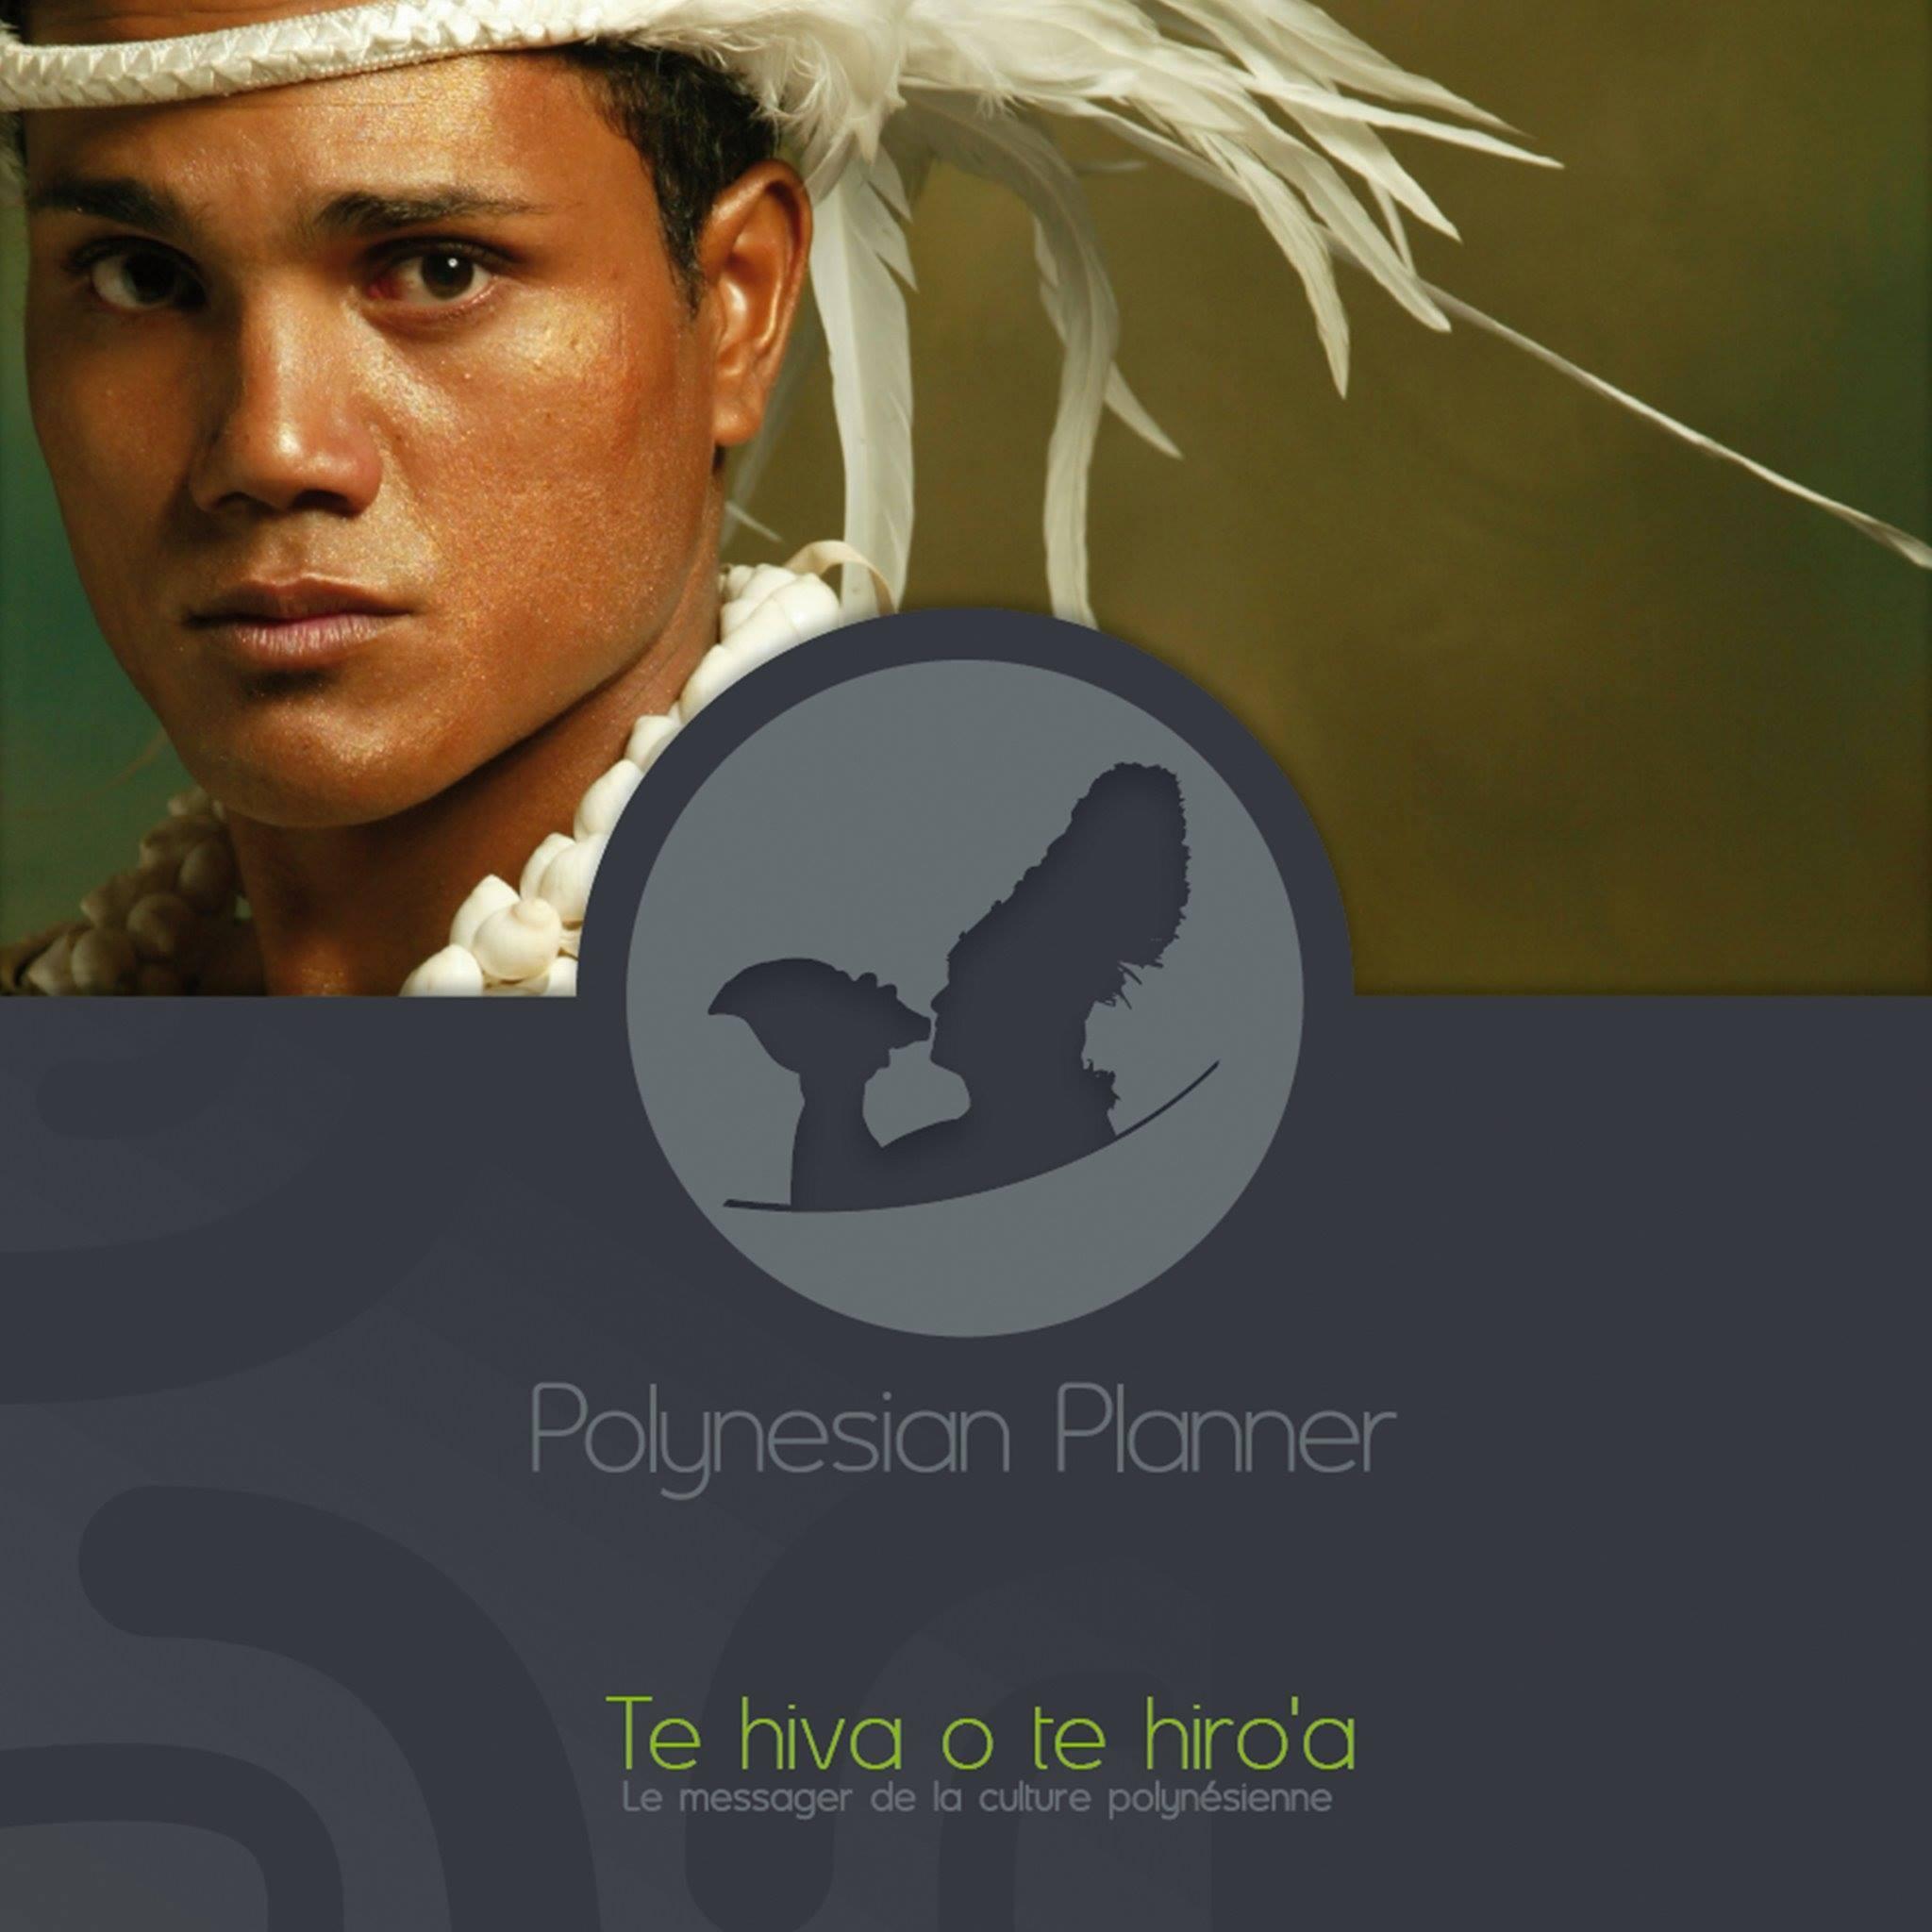 https://tahititourisme.com.br/wp-content/uploads/2017/08/polynesianplannerphotodeprofil.jpg